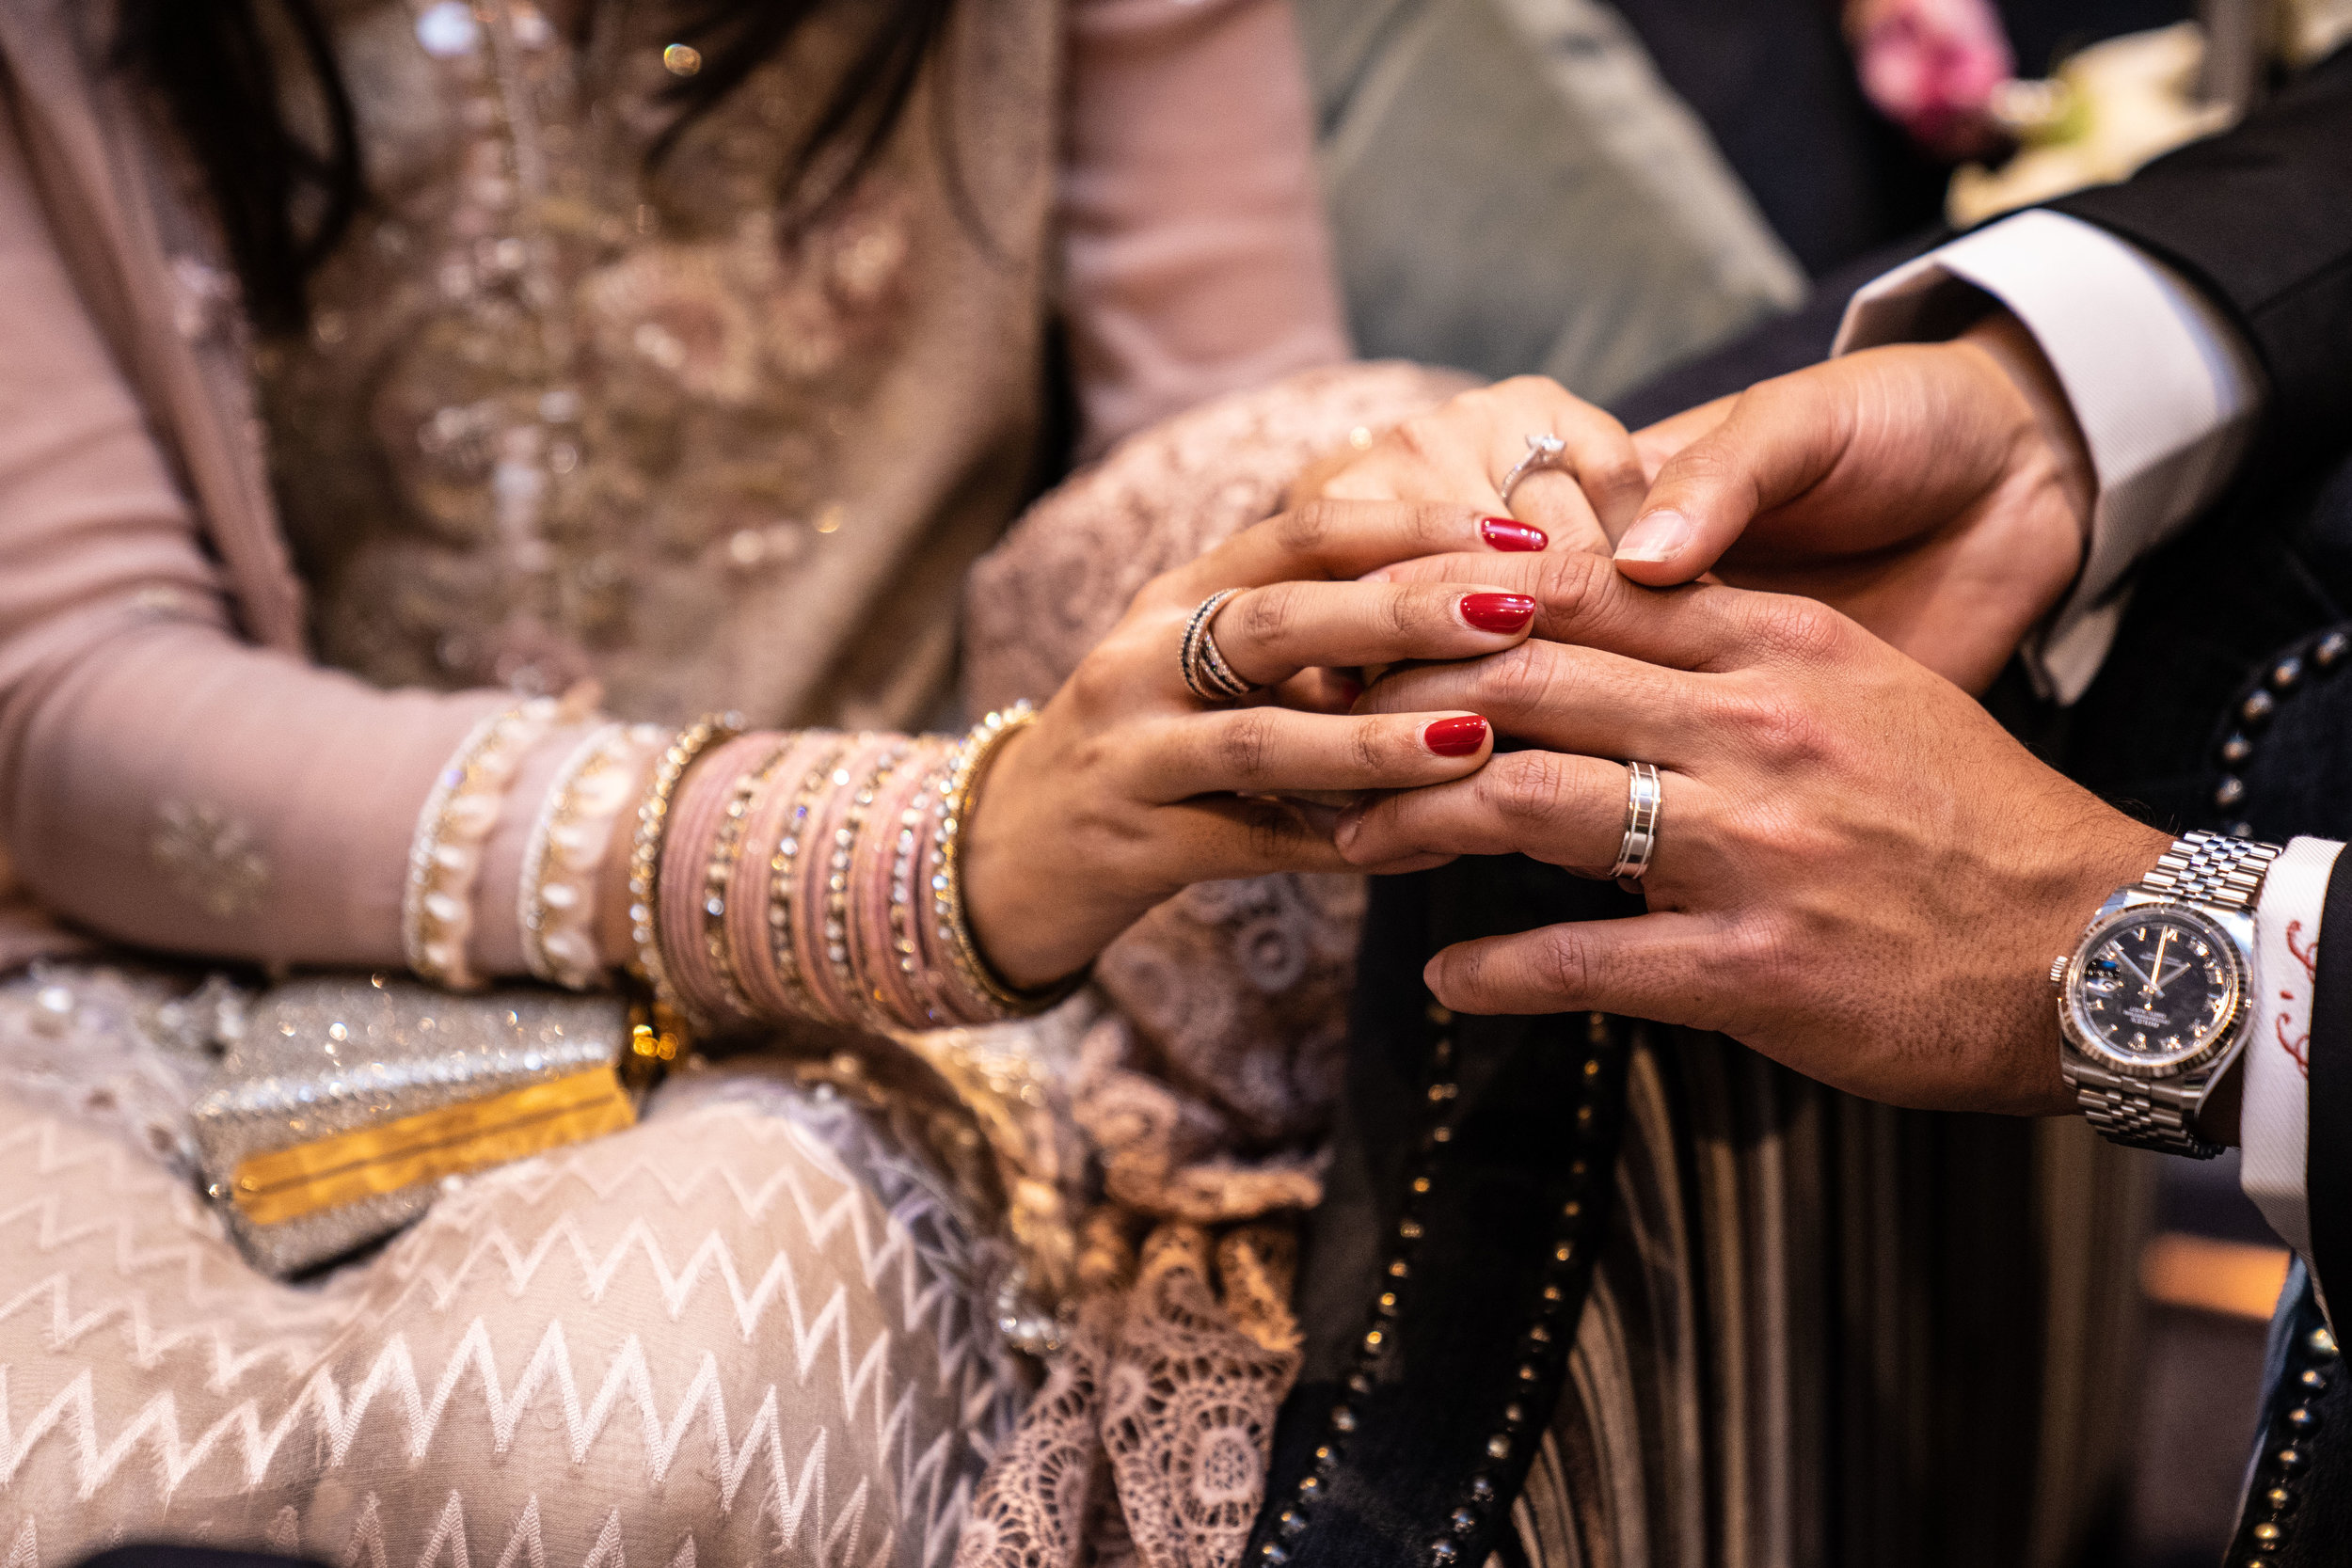 buckinghamshire-golf-club-winter-muslim-wedding-engagement-photography-videography-30